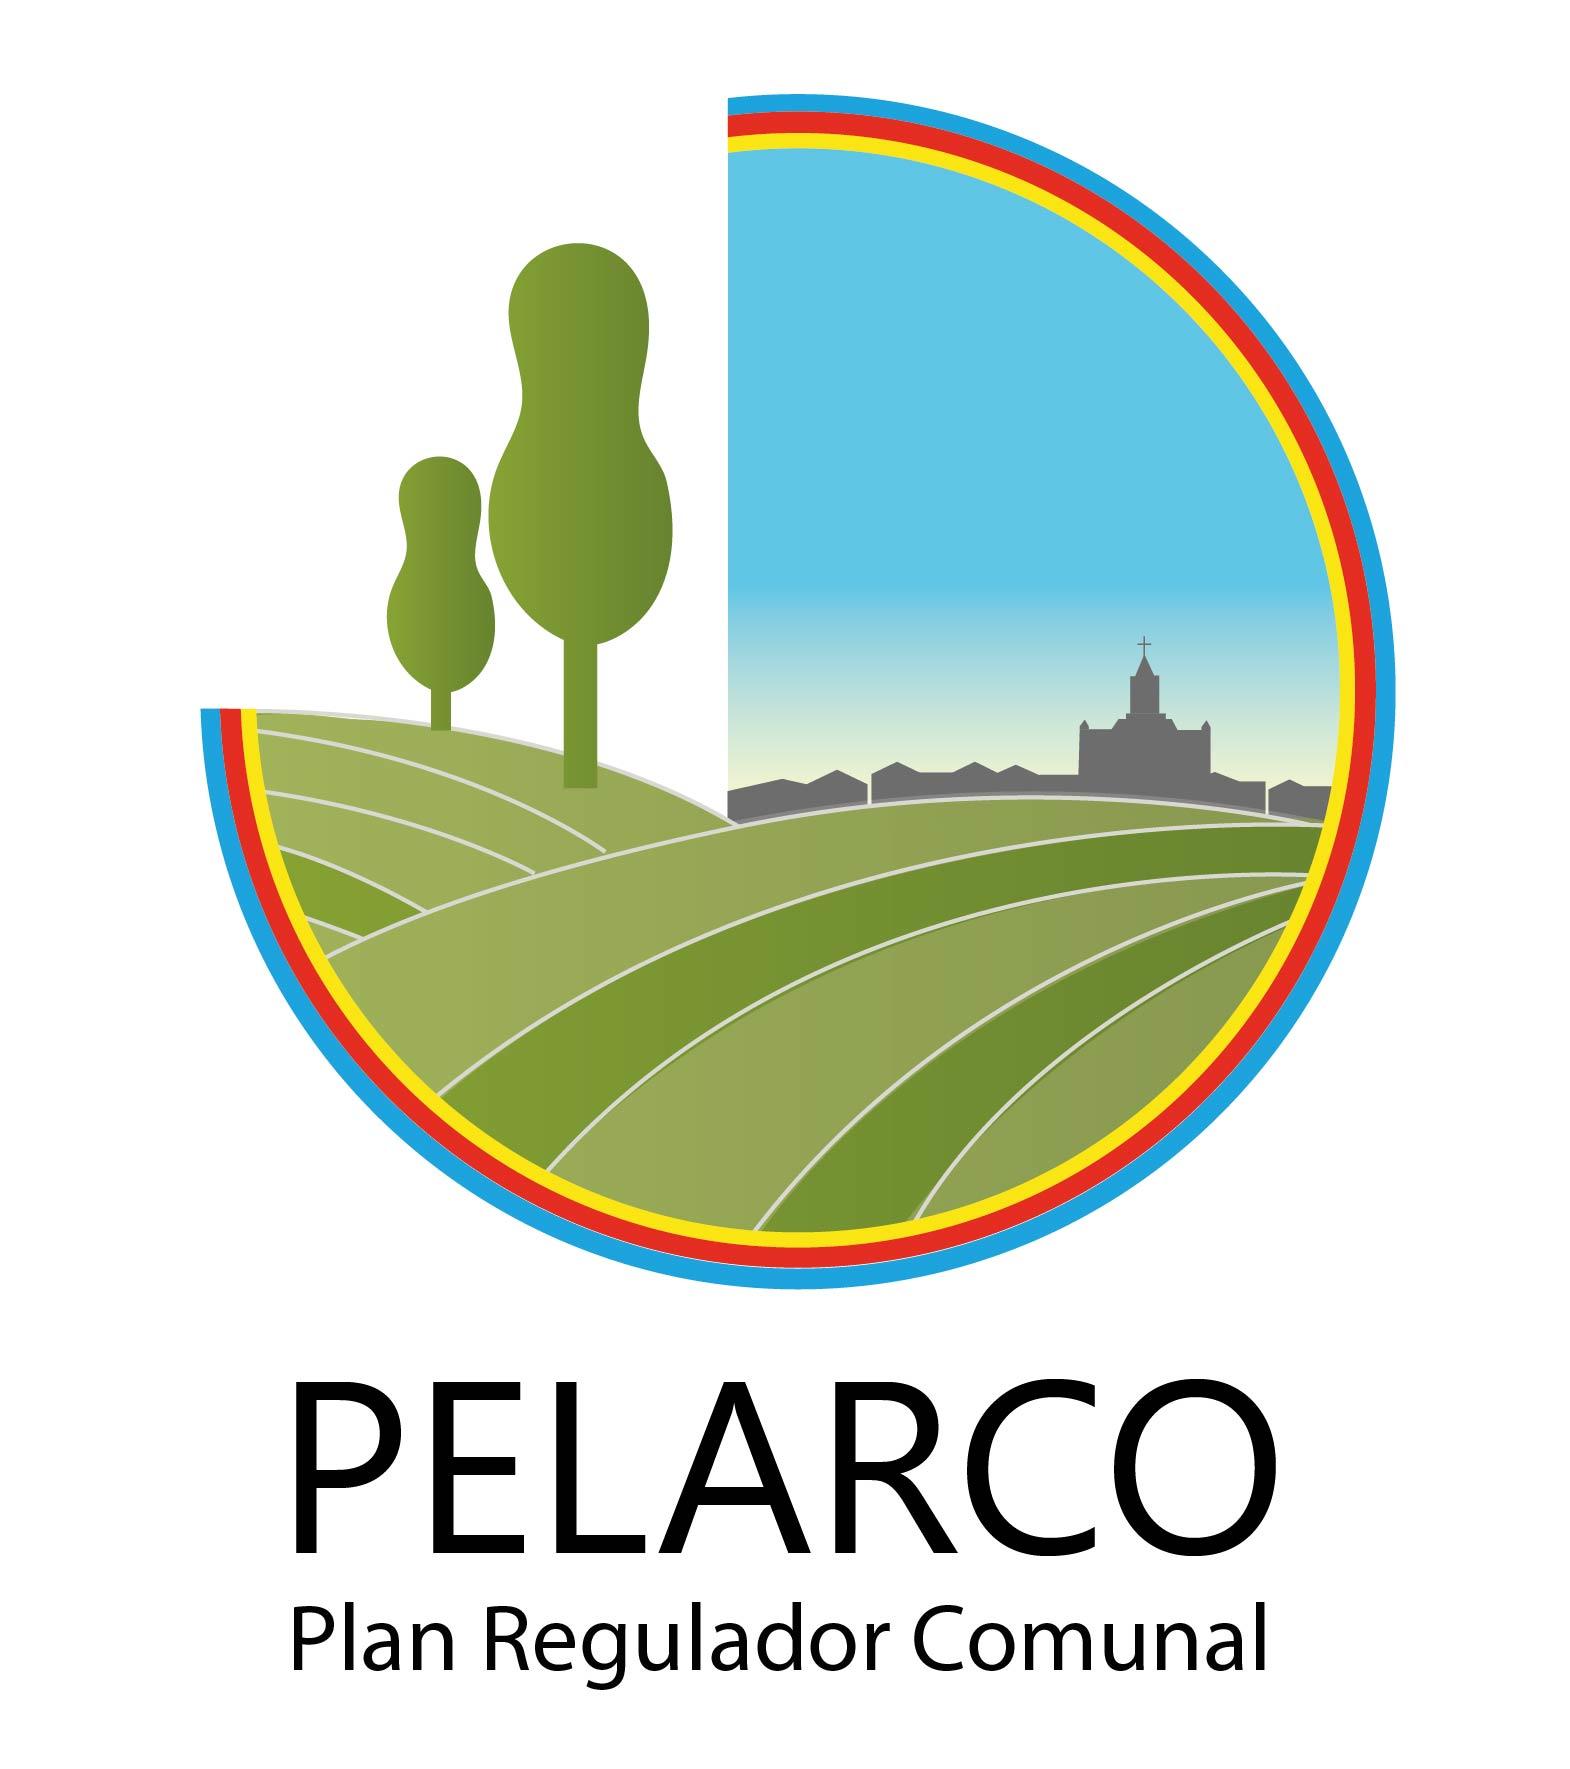 Pelarco PRC